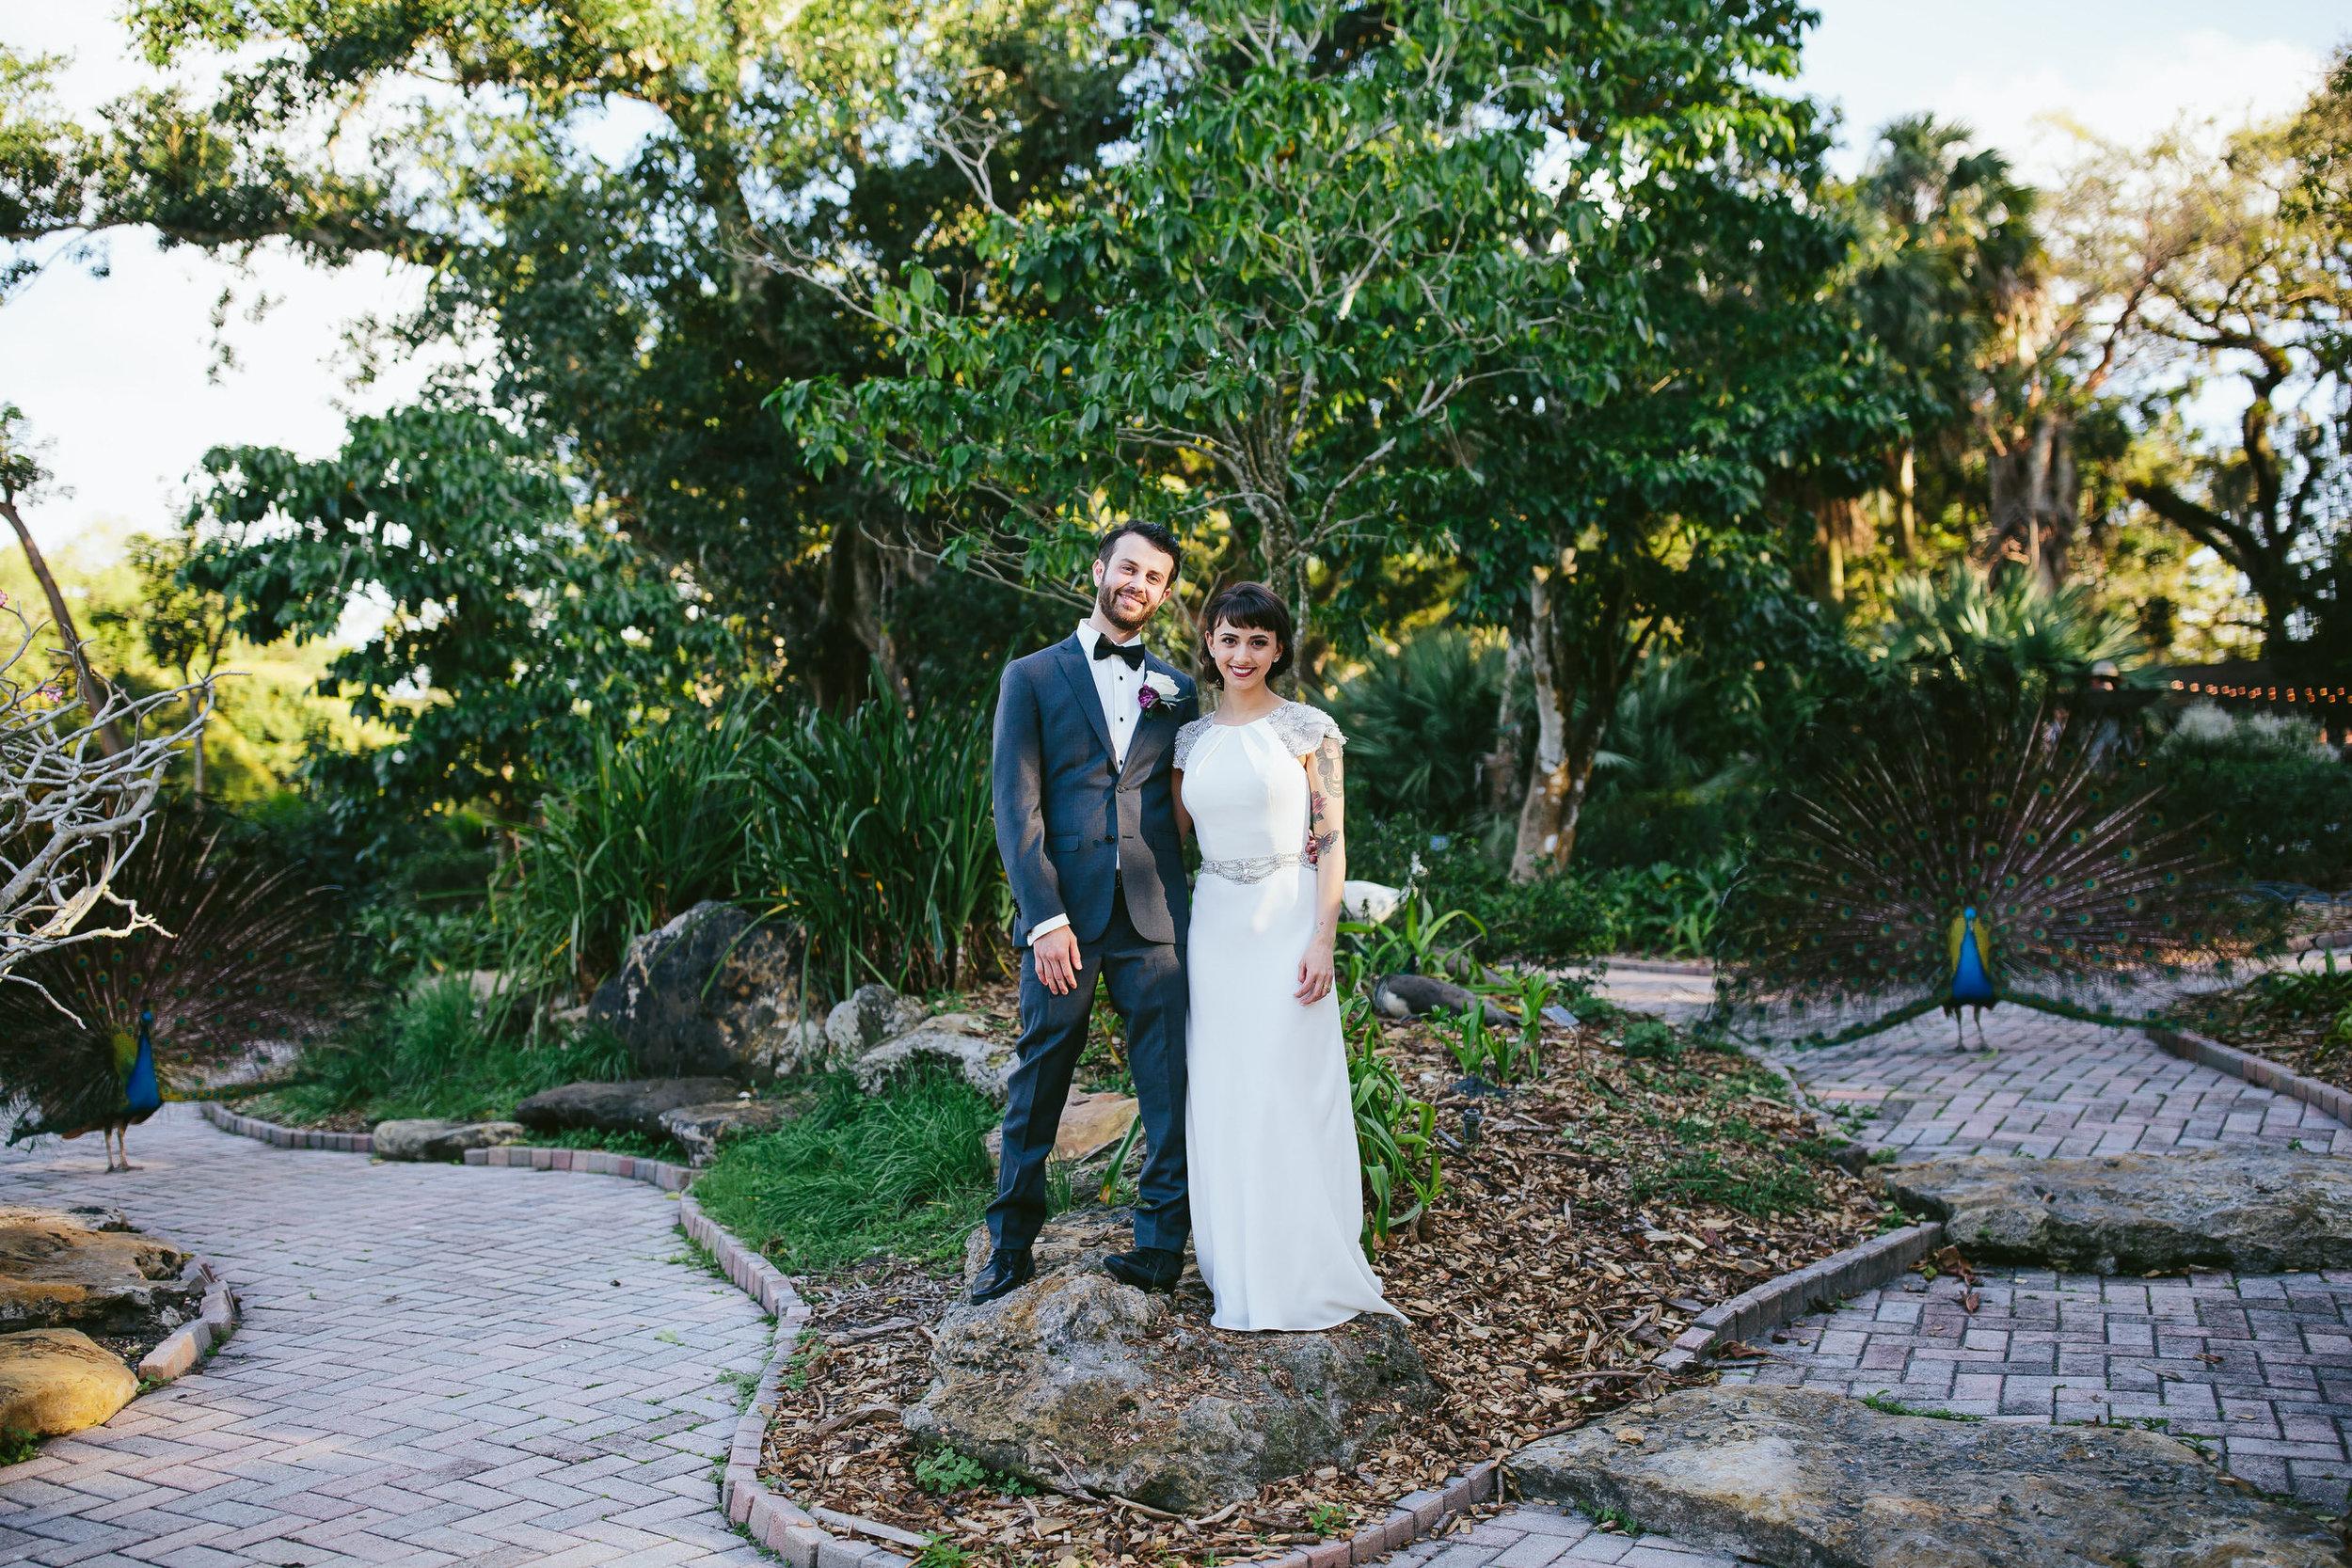 tiny-house-photo-flamingo-gardens-wedding-bride-and-groom-portraits-peacocks.jpg